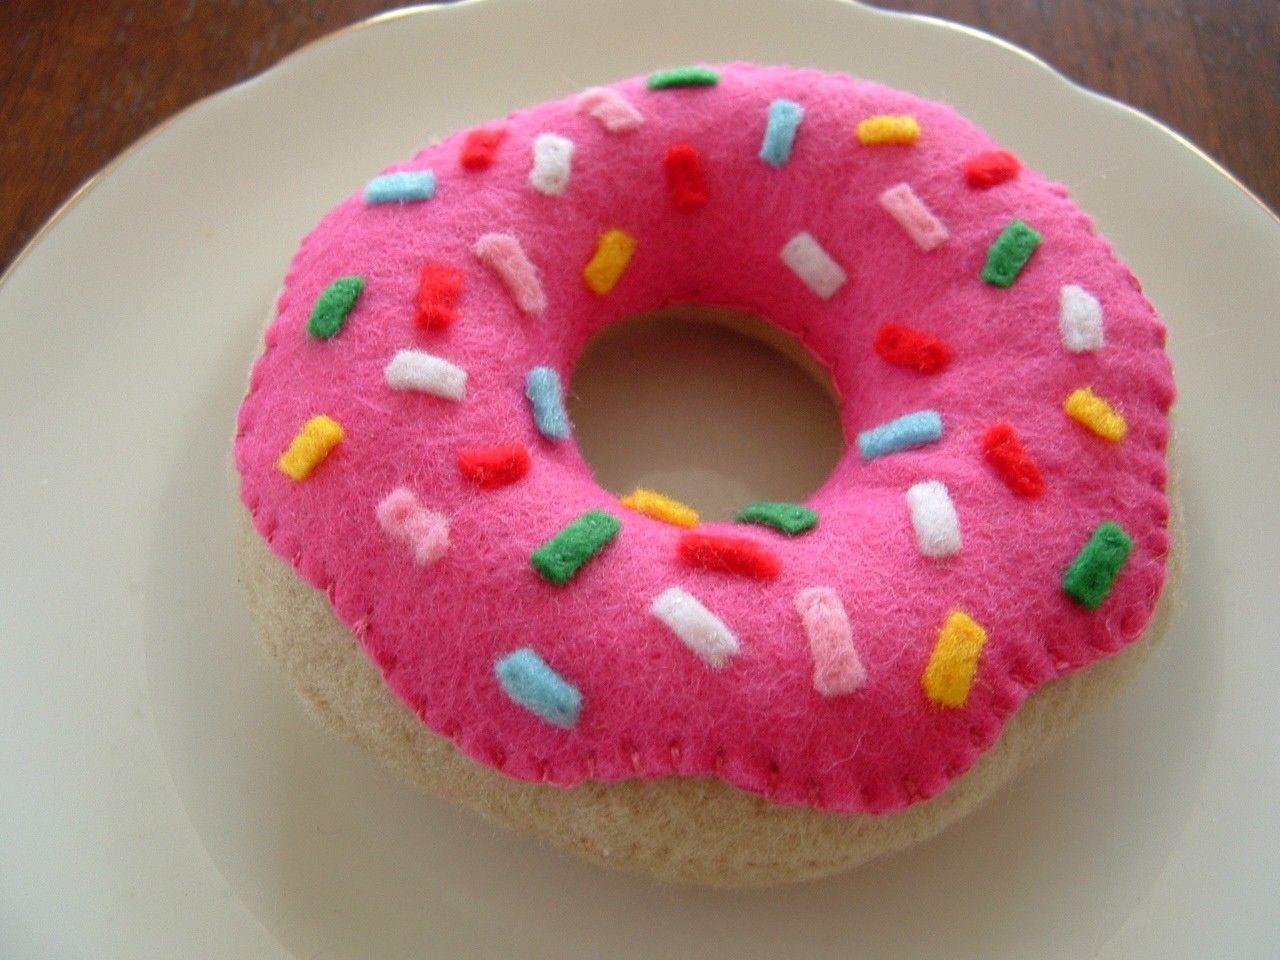 Free Tutorial For Felt Food Doughnuts